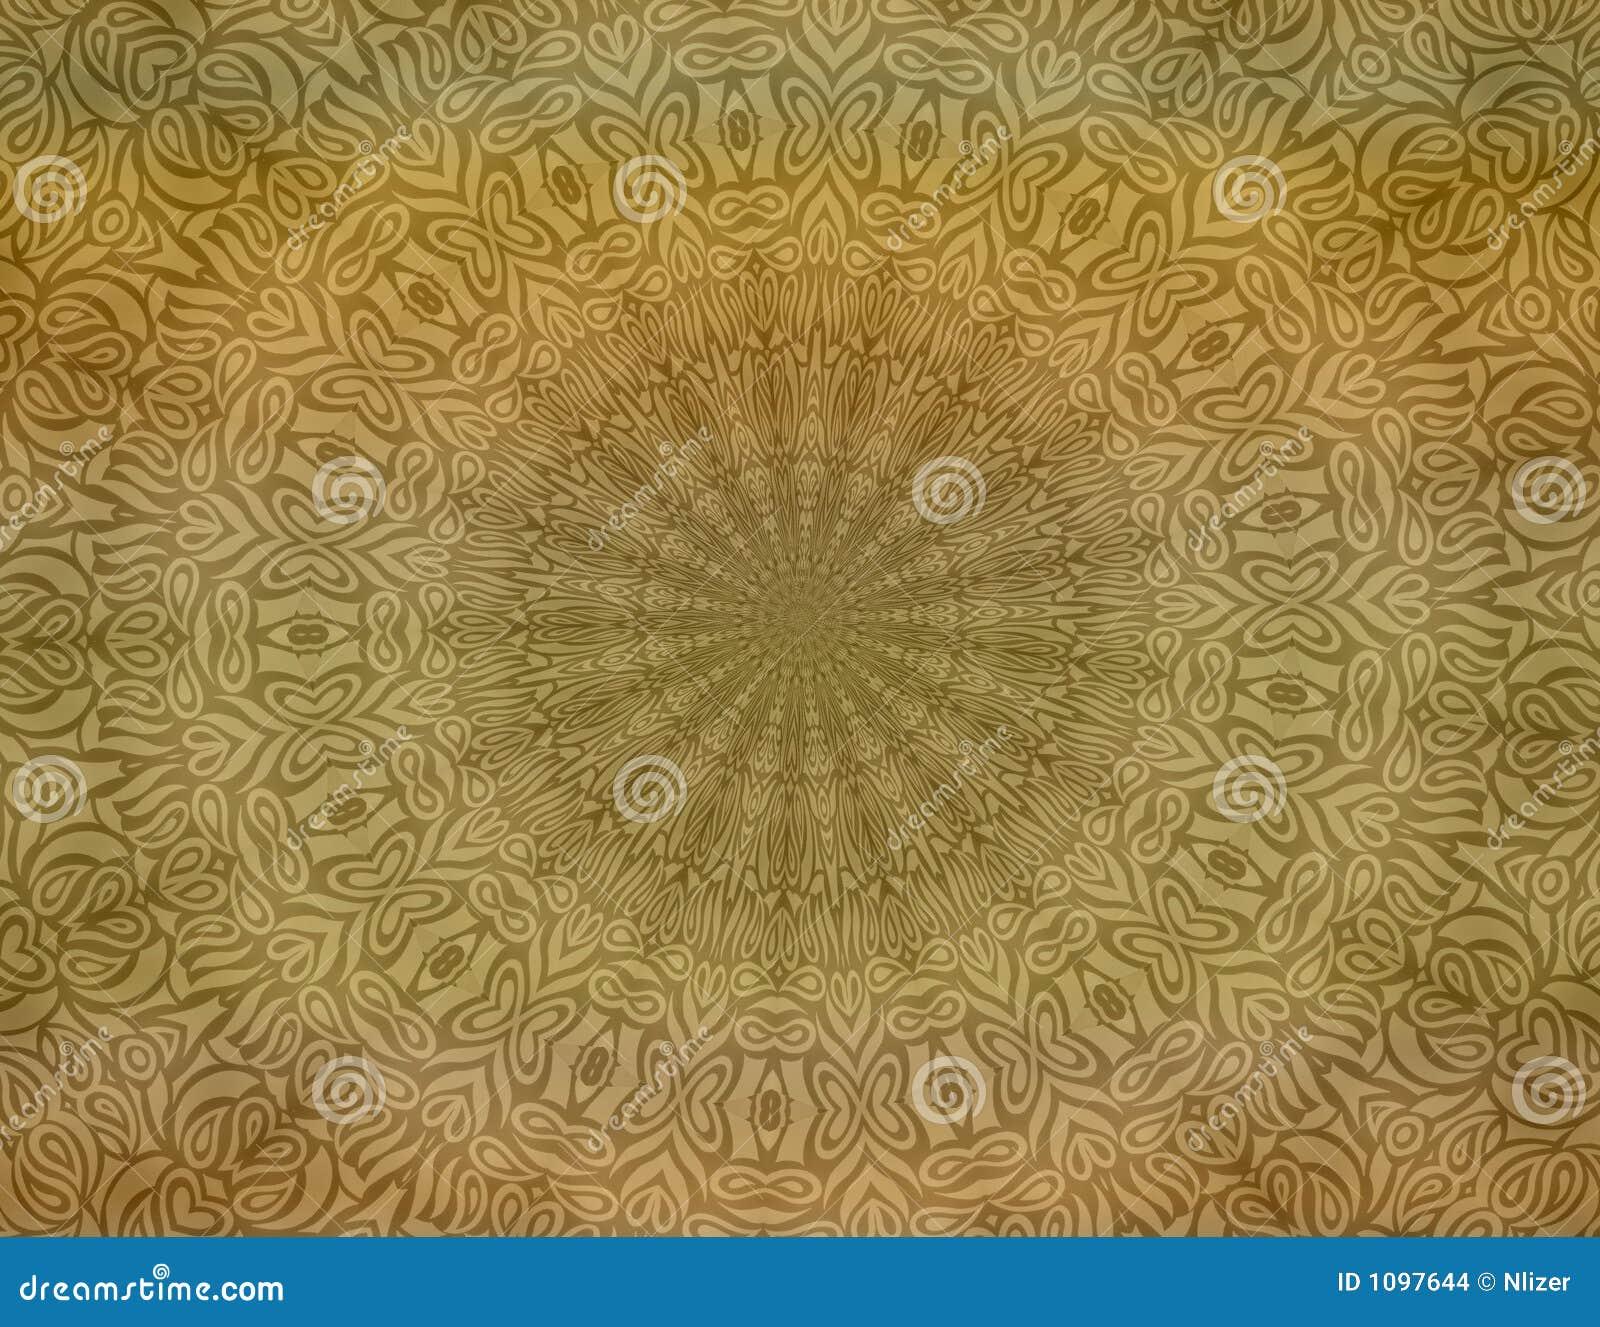 Tan Batik Background Wallpaper Stock Illustration